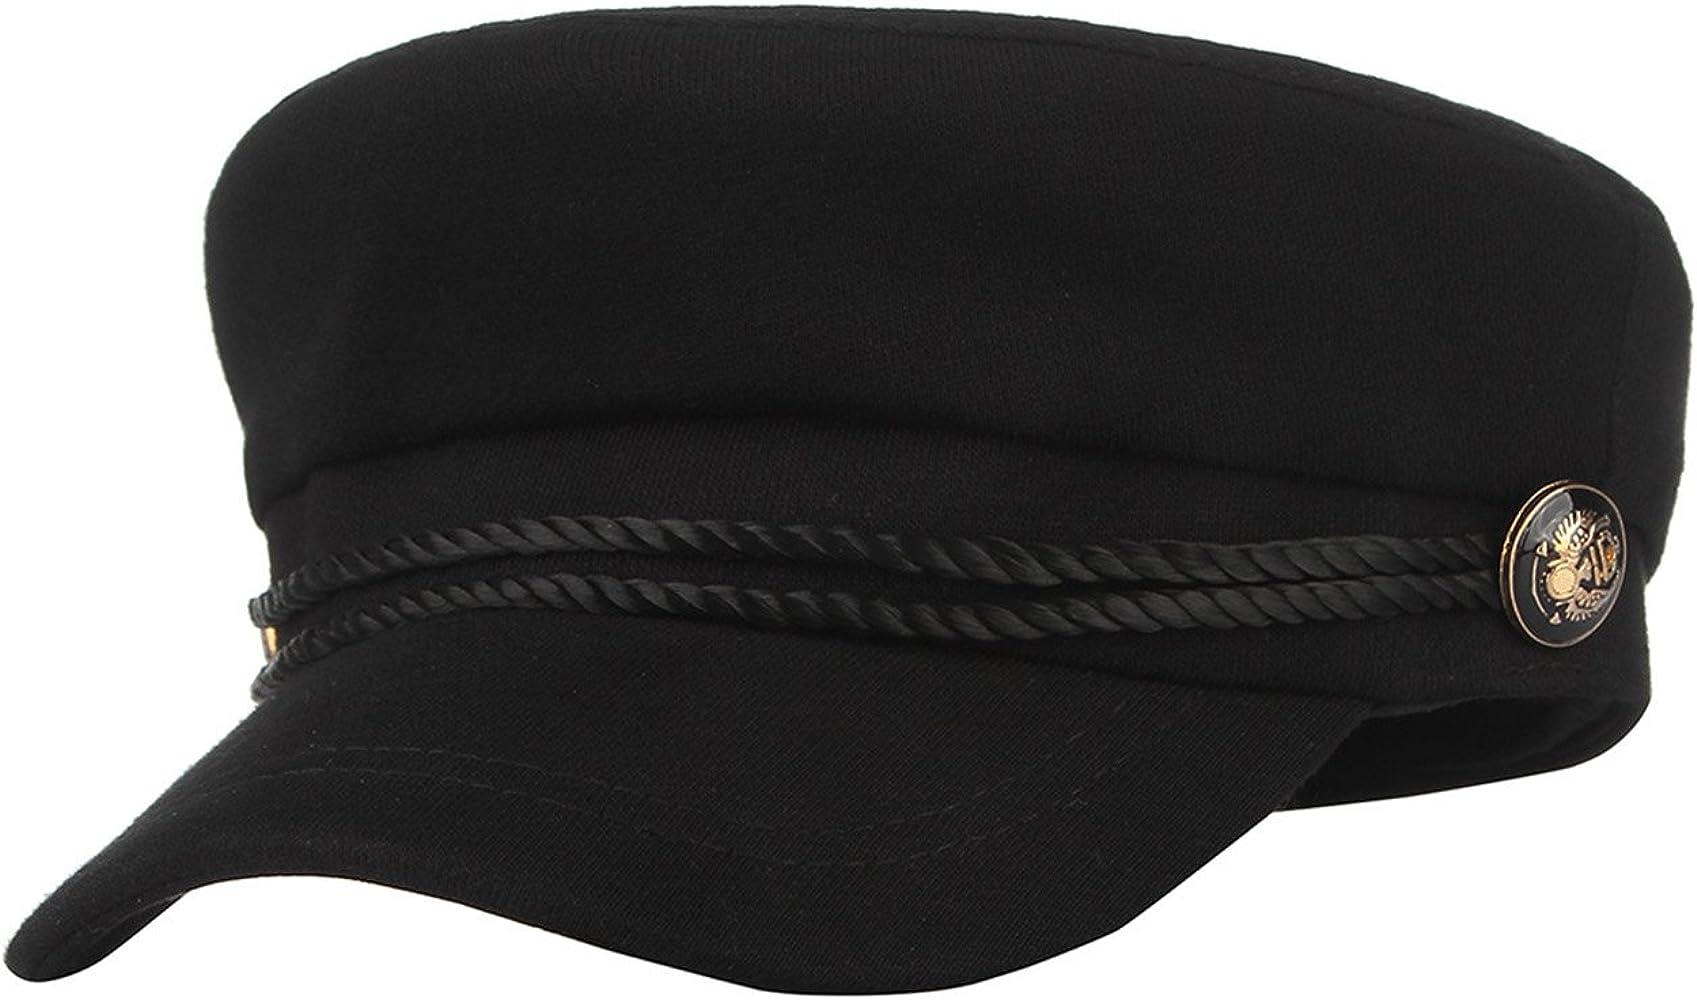 Sombrero Beret para Hombre Newsboy Flat Cap Flat Boy Baker